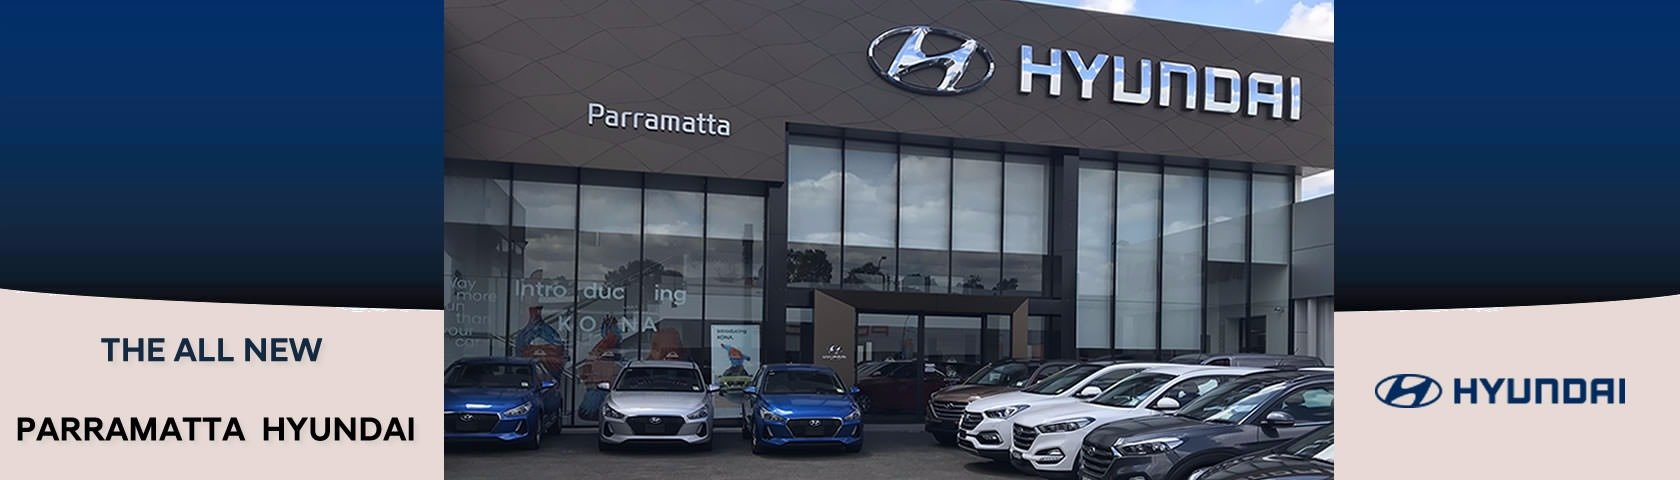 Welcome to Parramatta Hyundai